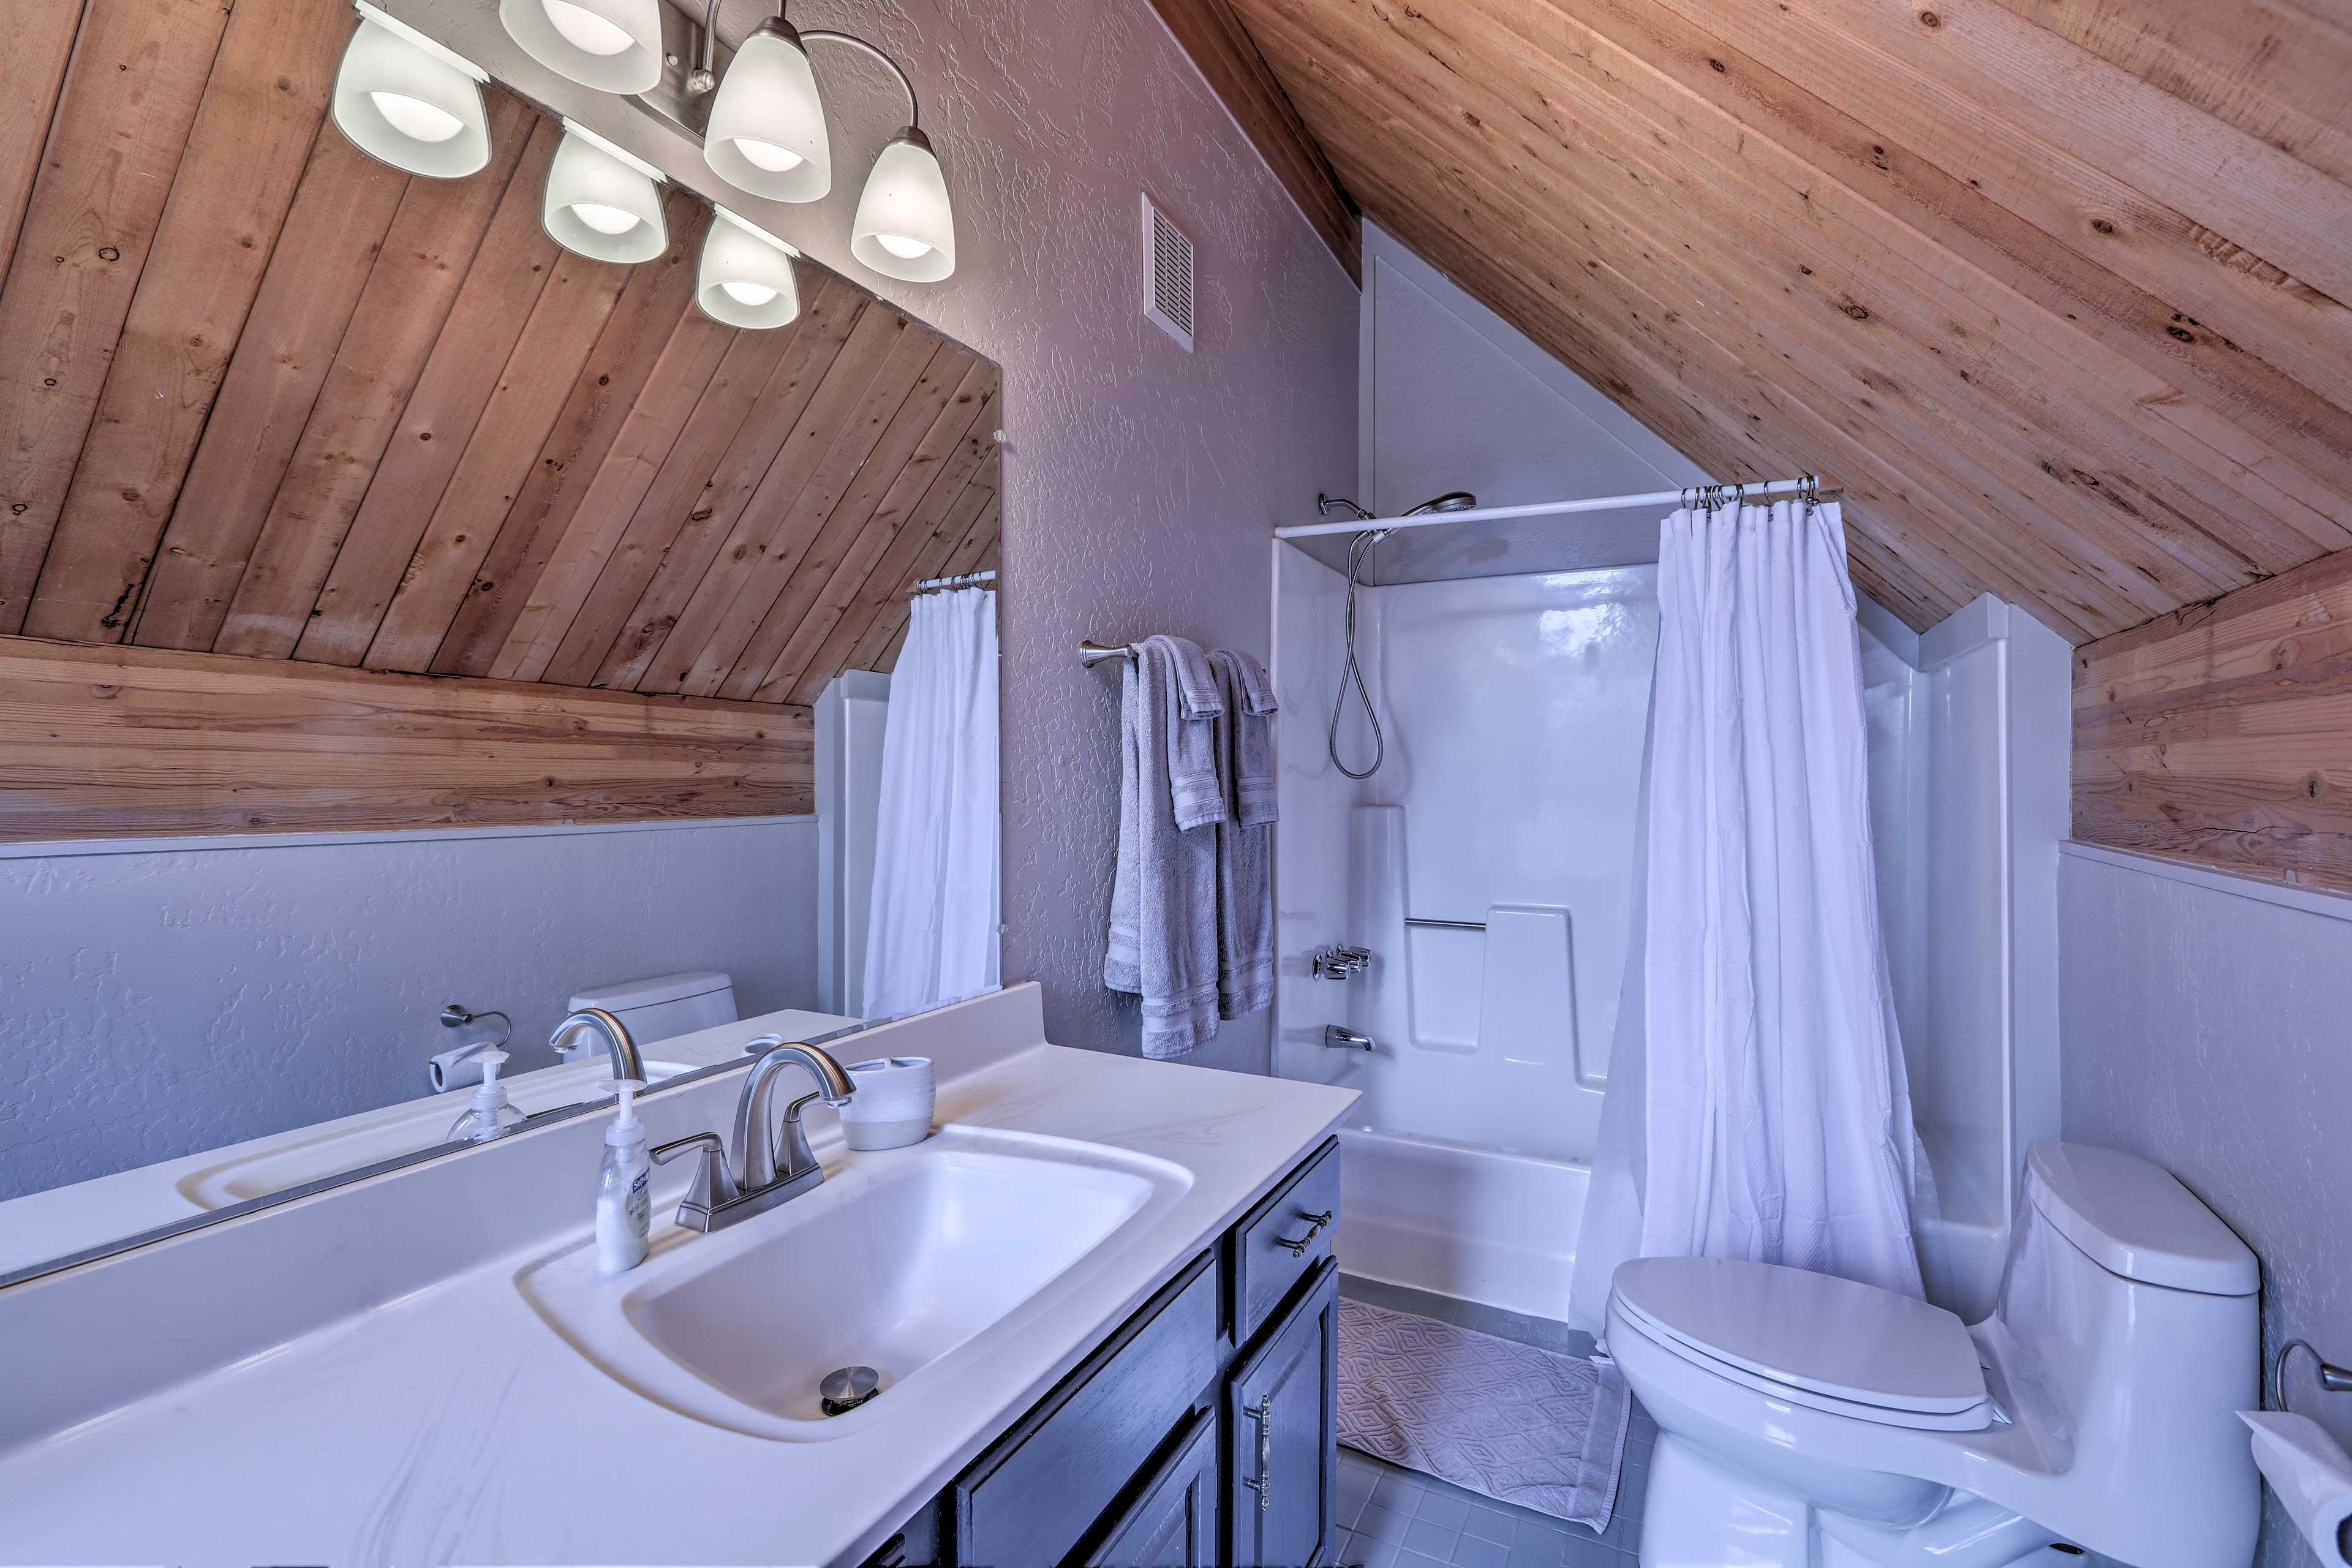 This top floor also has an en-suite bathroom for your convenience.